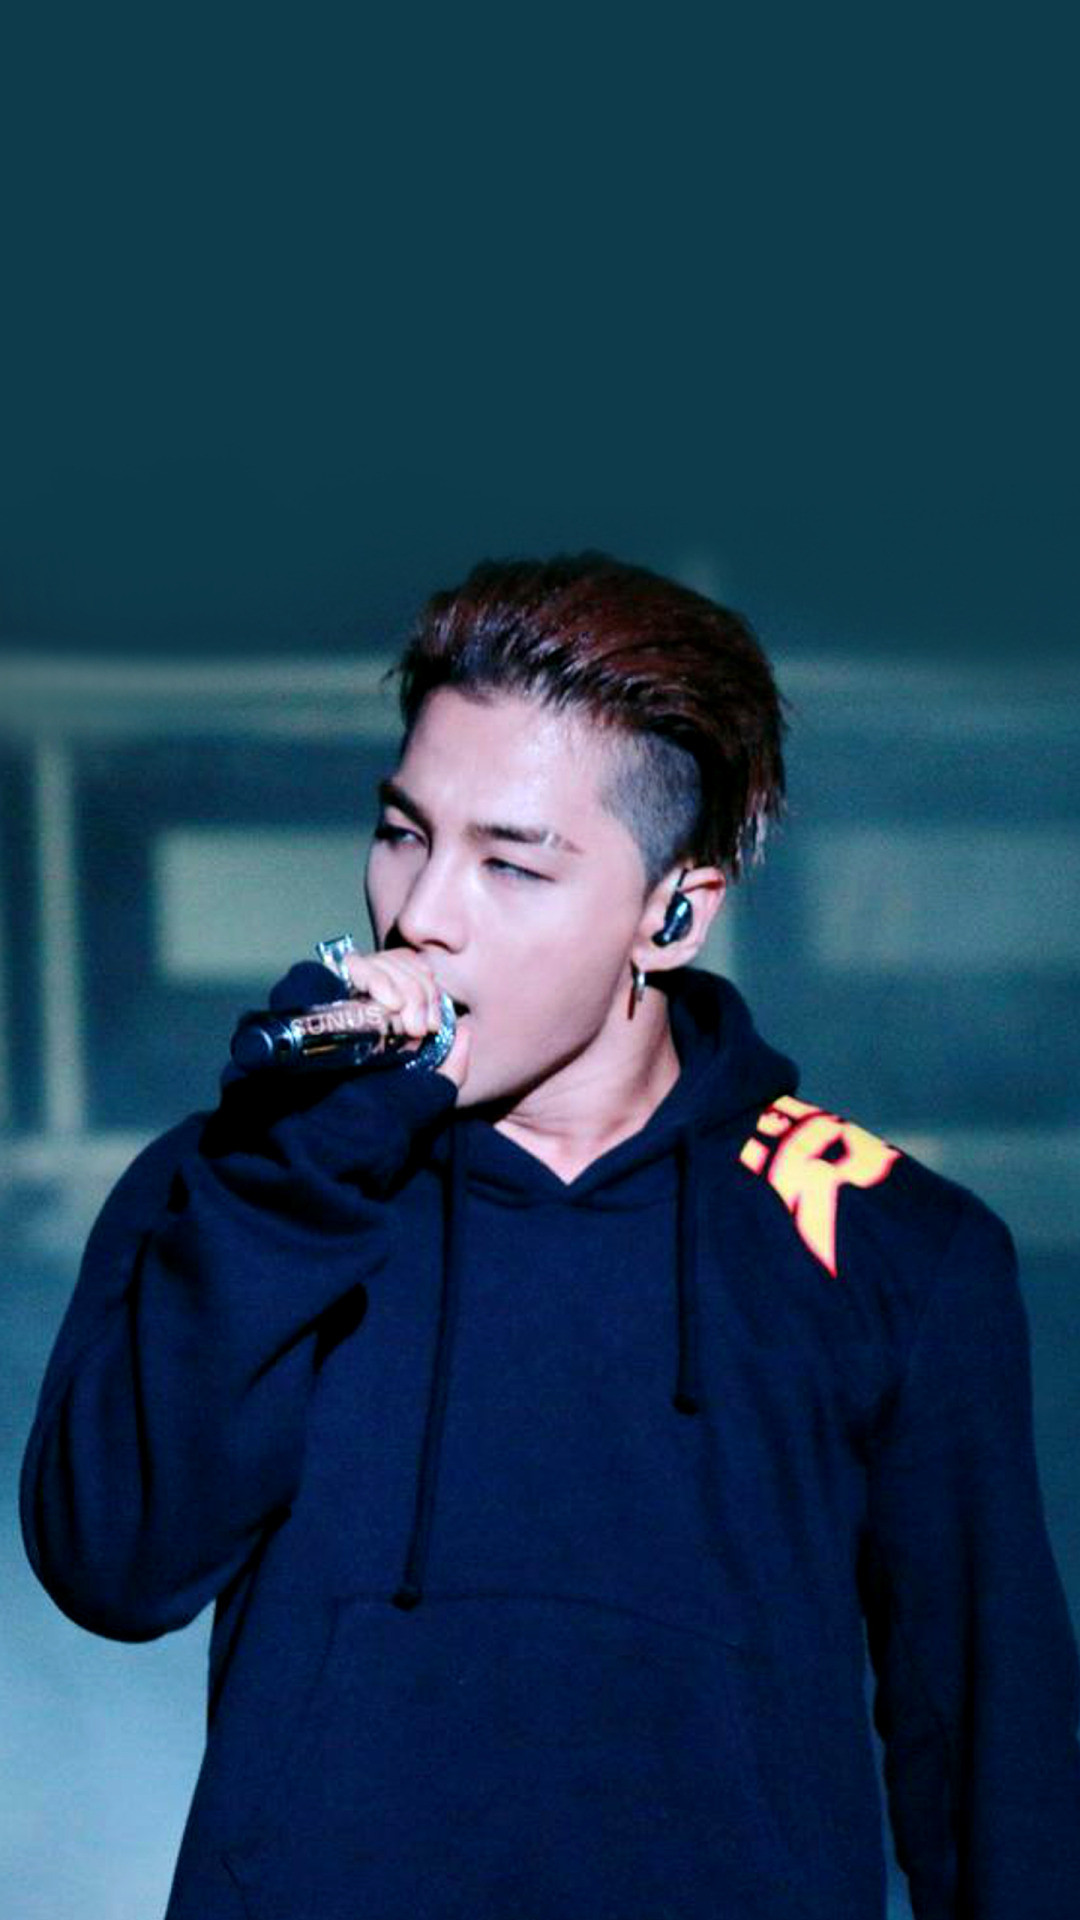 Taeyang Big Bang Dong Youngbae Kpop Wallpapers Taeyang Taeyang Bigbang Wallpaper Hd 1080x19 Download Hd Wallpaper Wallpapertip